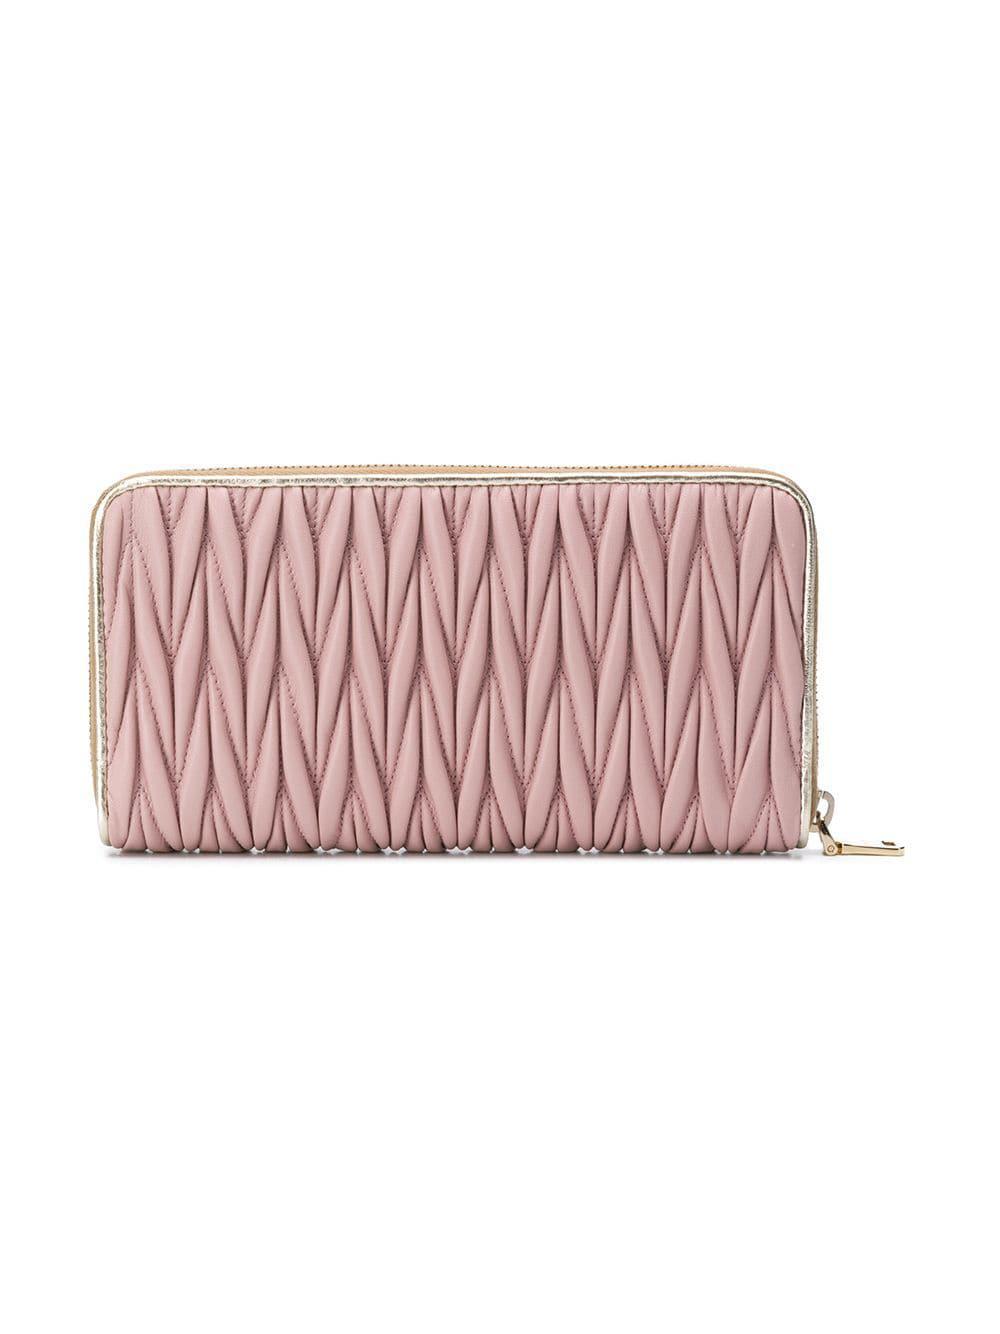 f94b33da10ba Lyst - Miu Miu Matelassé Continental Wallet in Pink